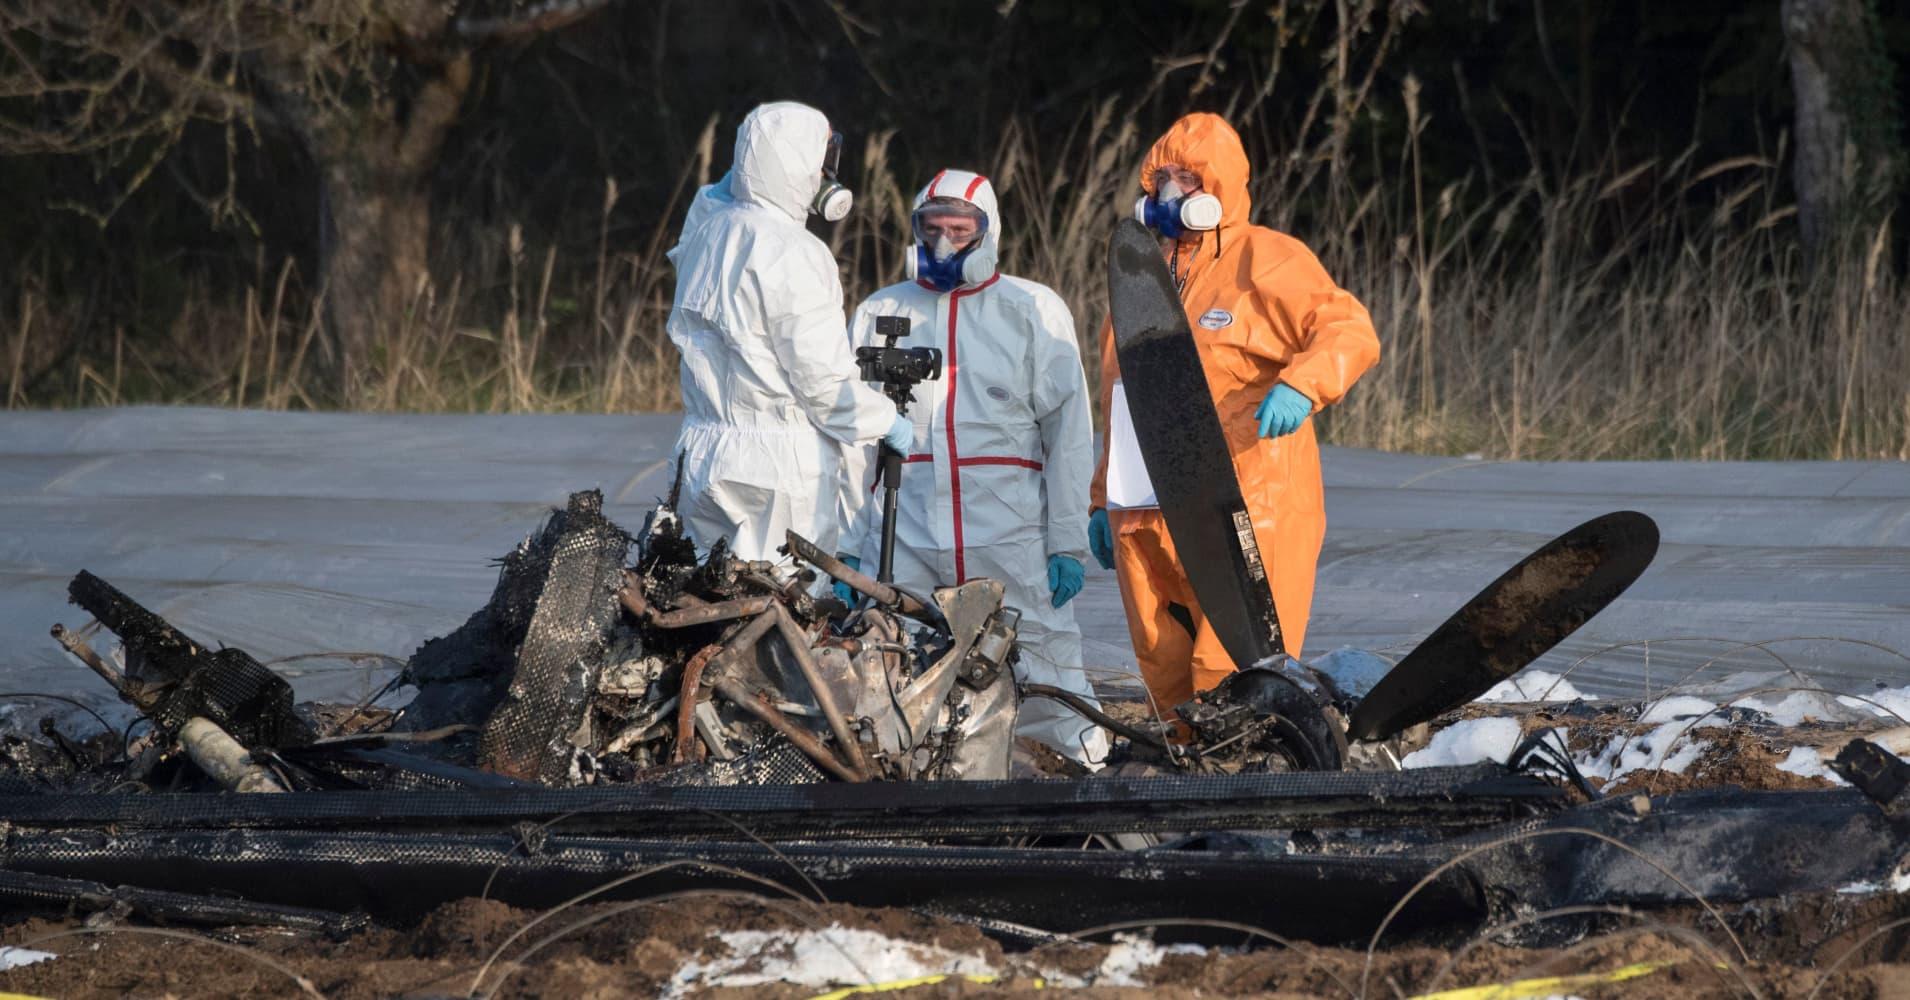 Co-owner of Russia's S7 airline dies in plane crash near Frankfurt